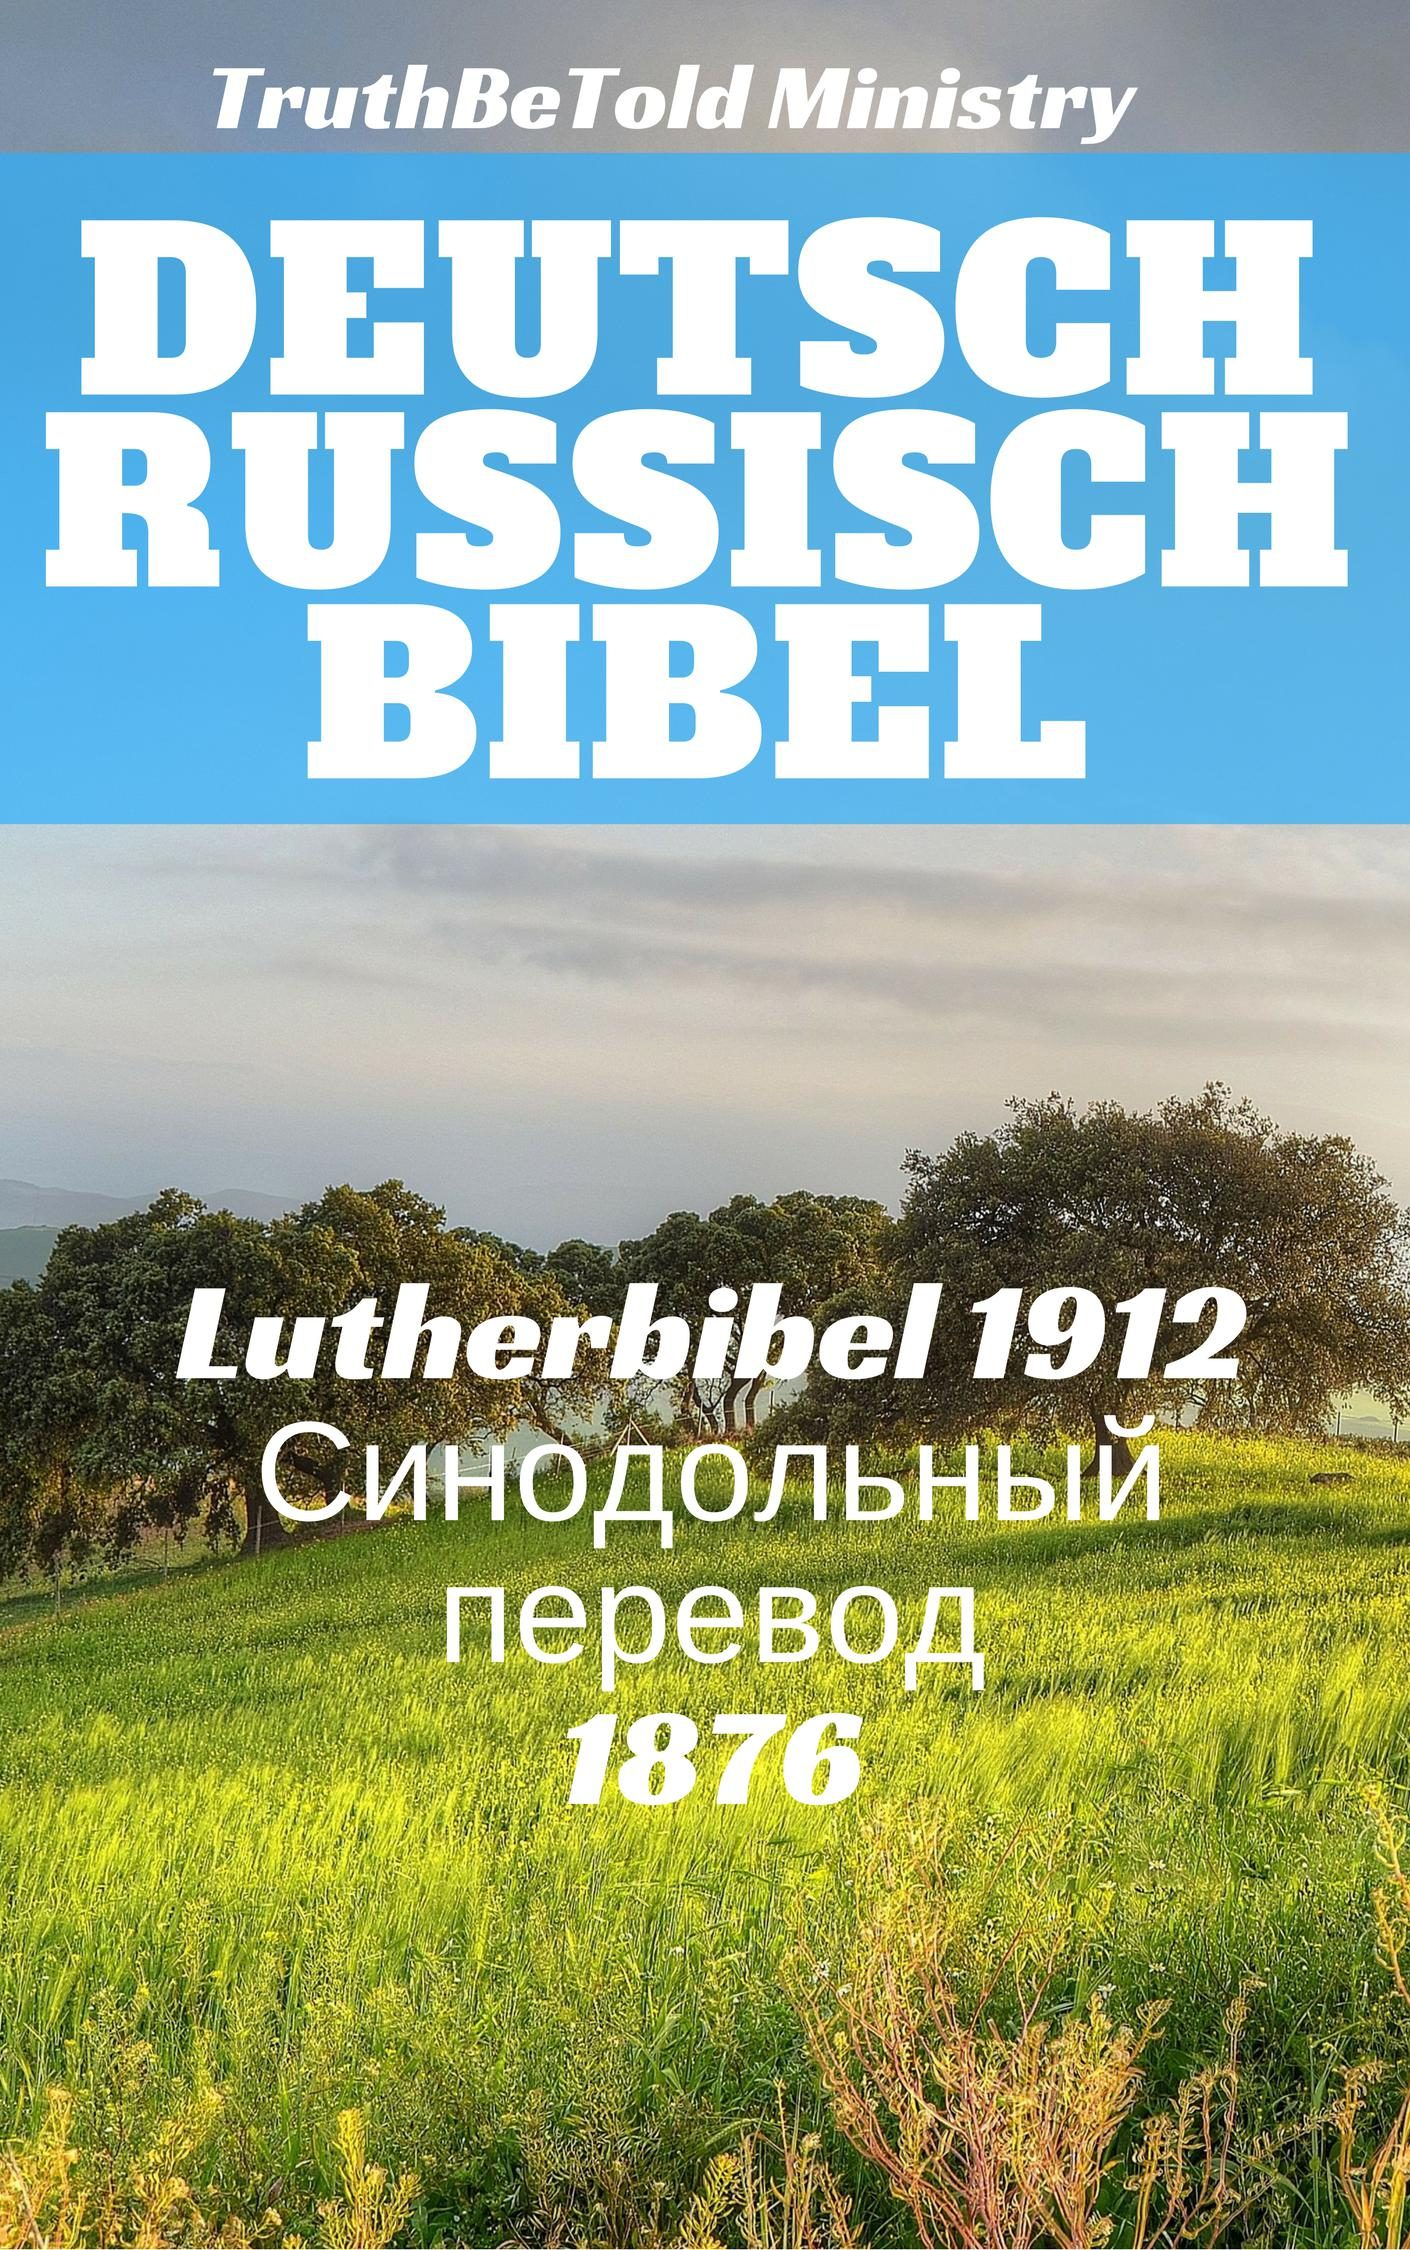 Lutherbibel 1912 Pdf